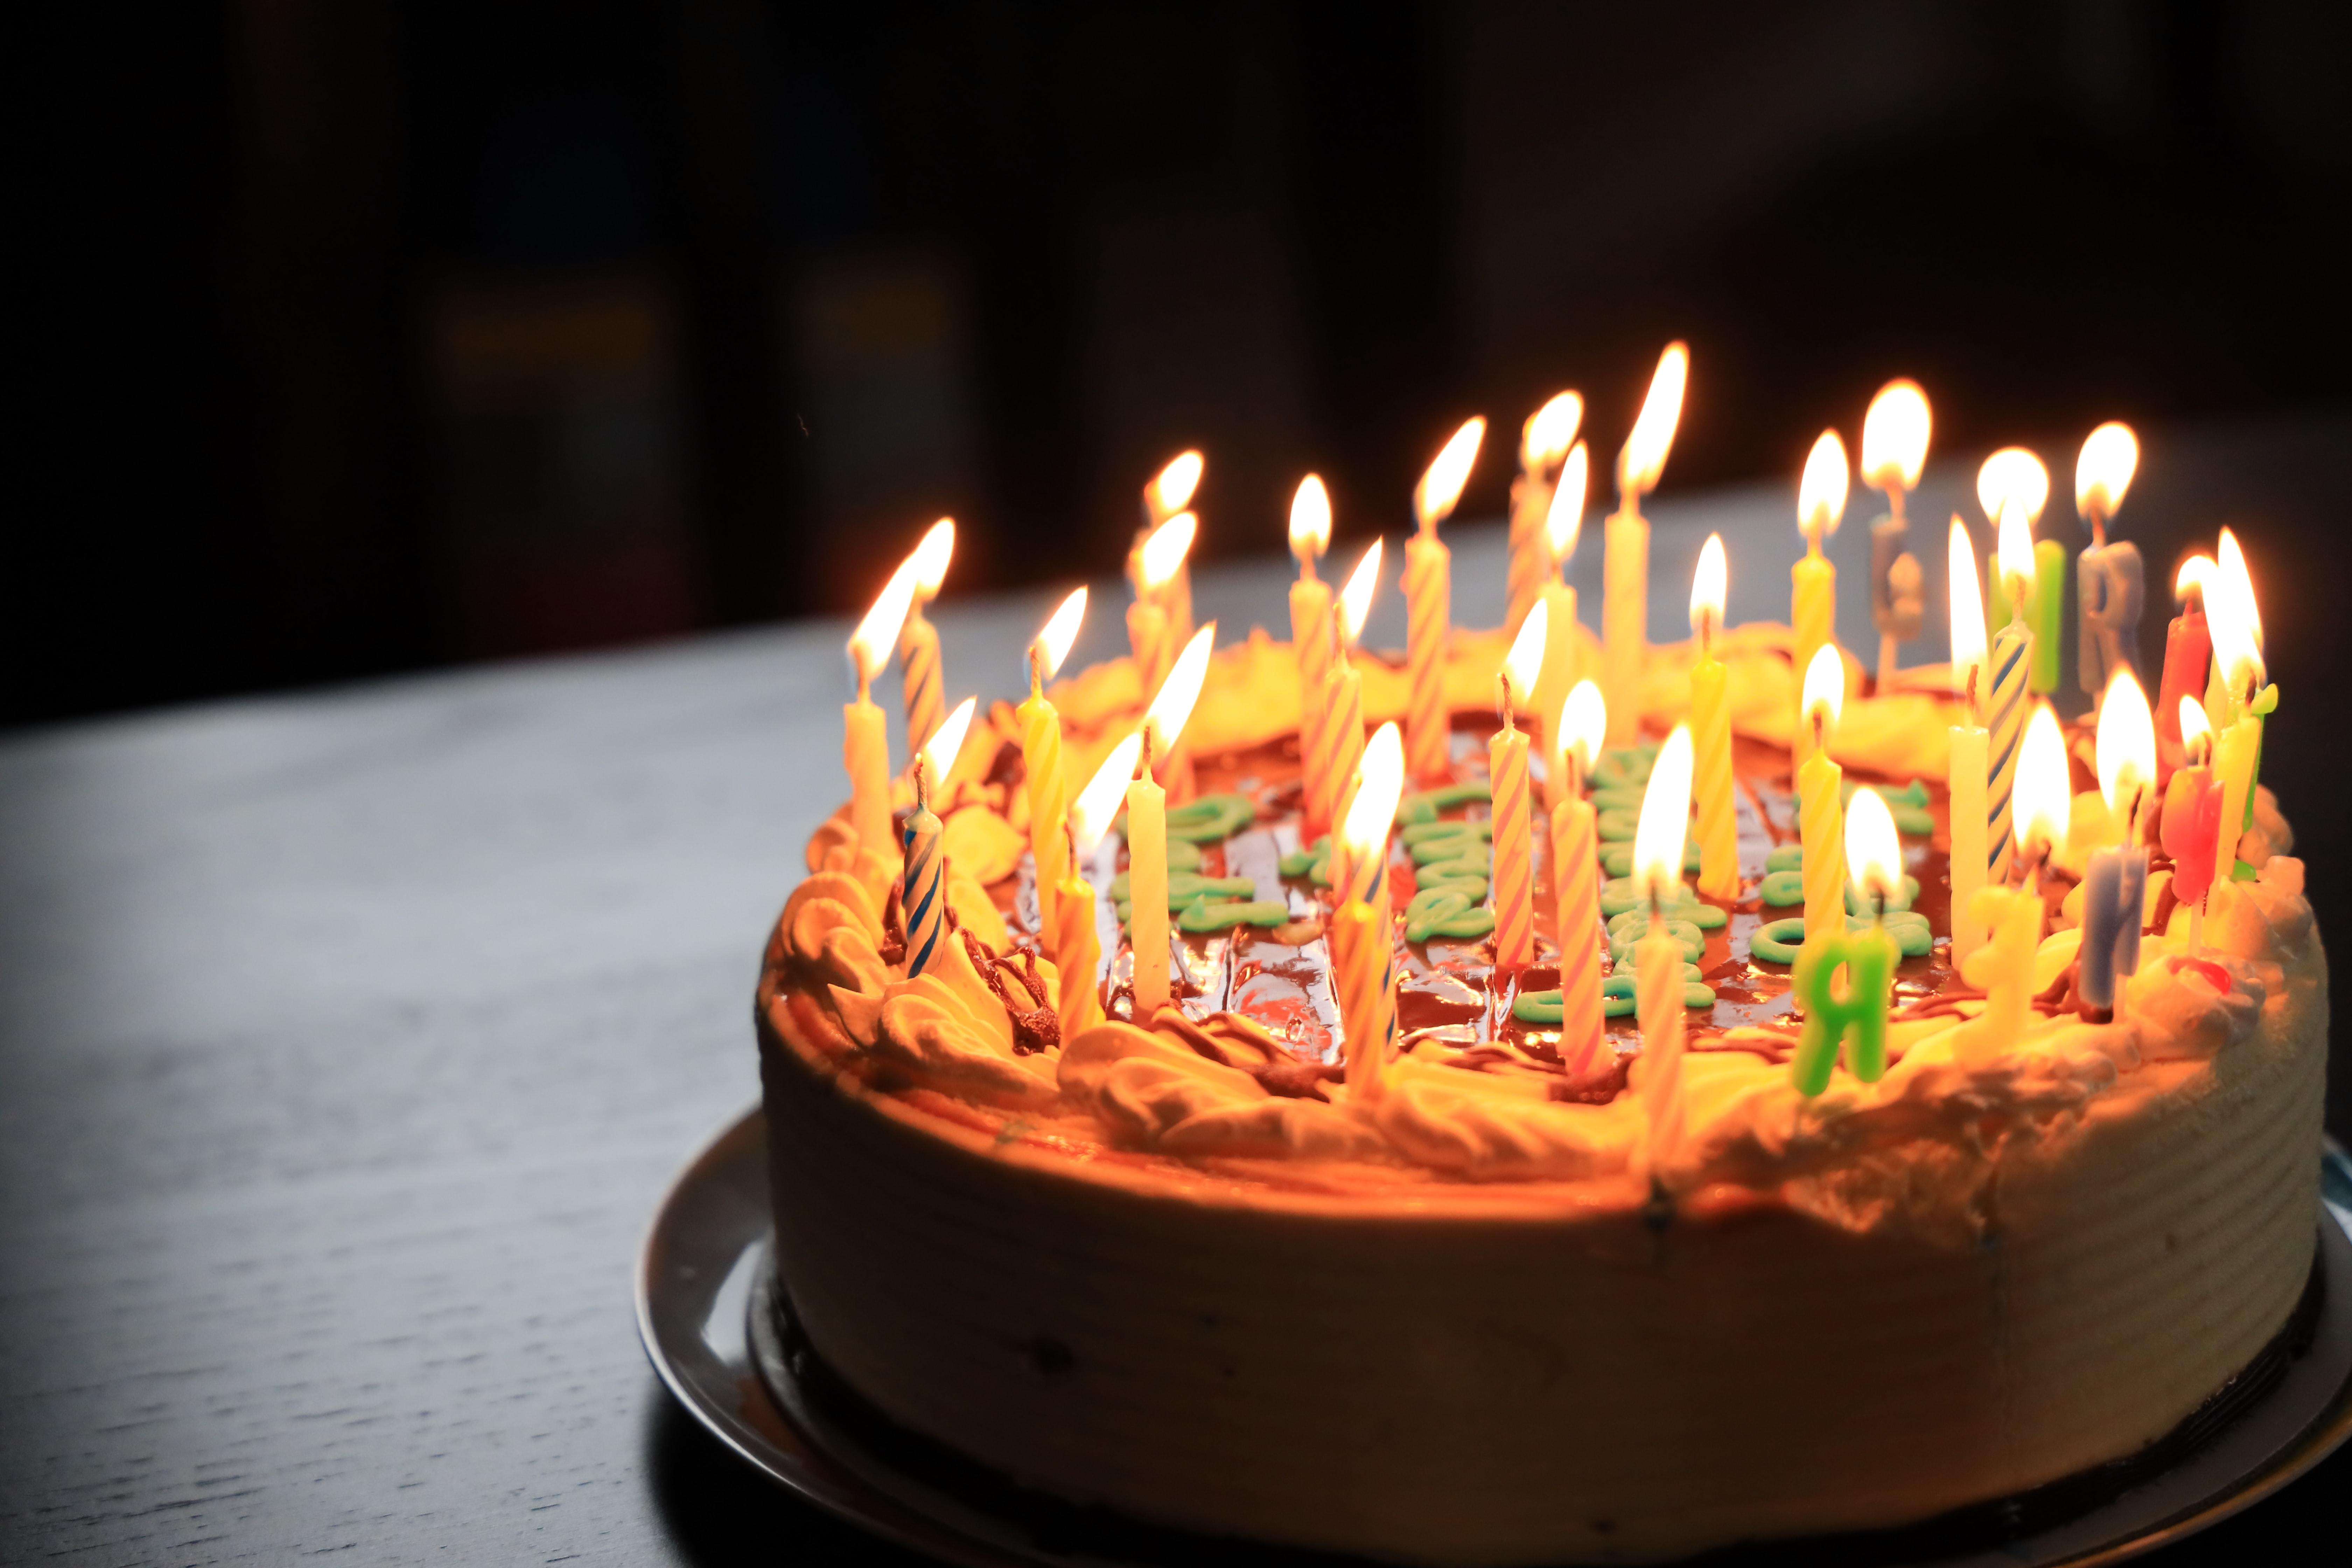 Photo of a birthday cake with lit candles on top. Image courtesy of Richard Burlton via Unsplash.